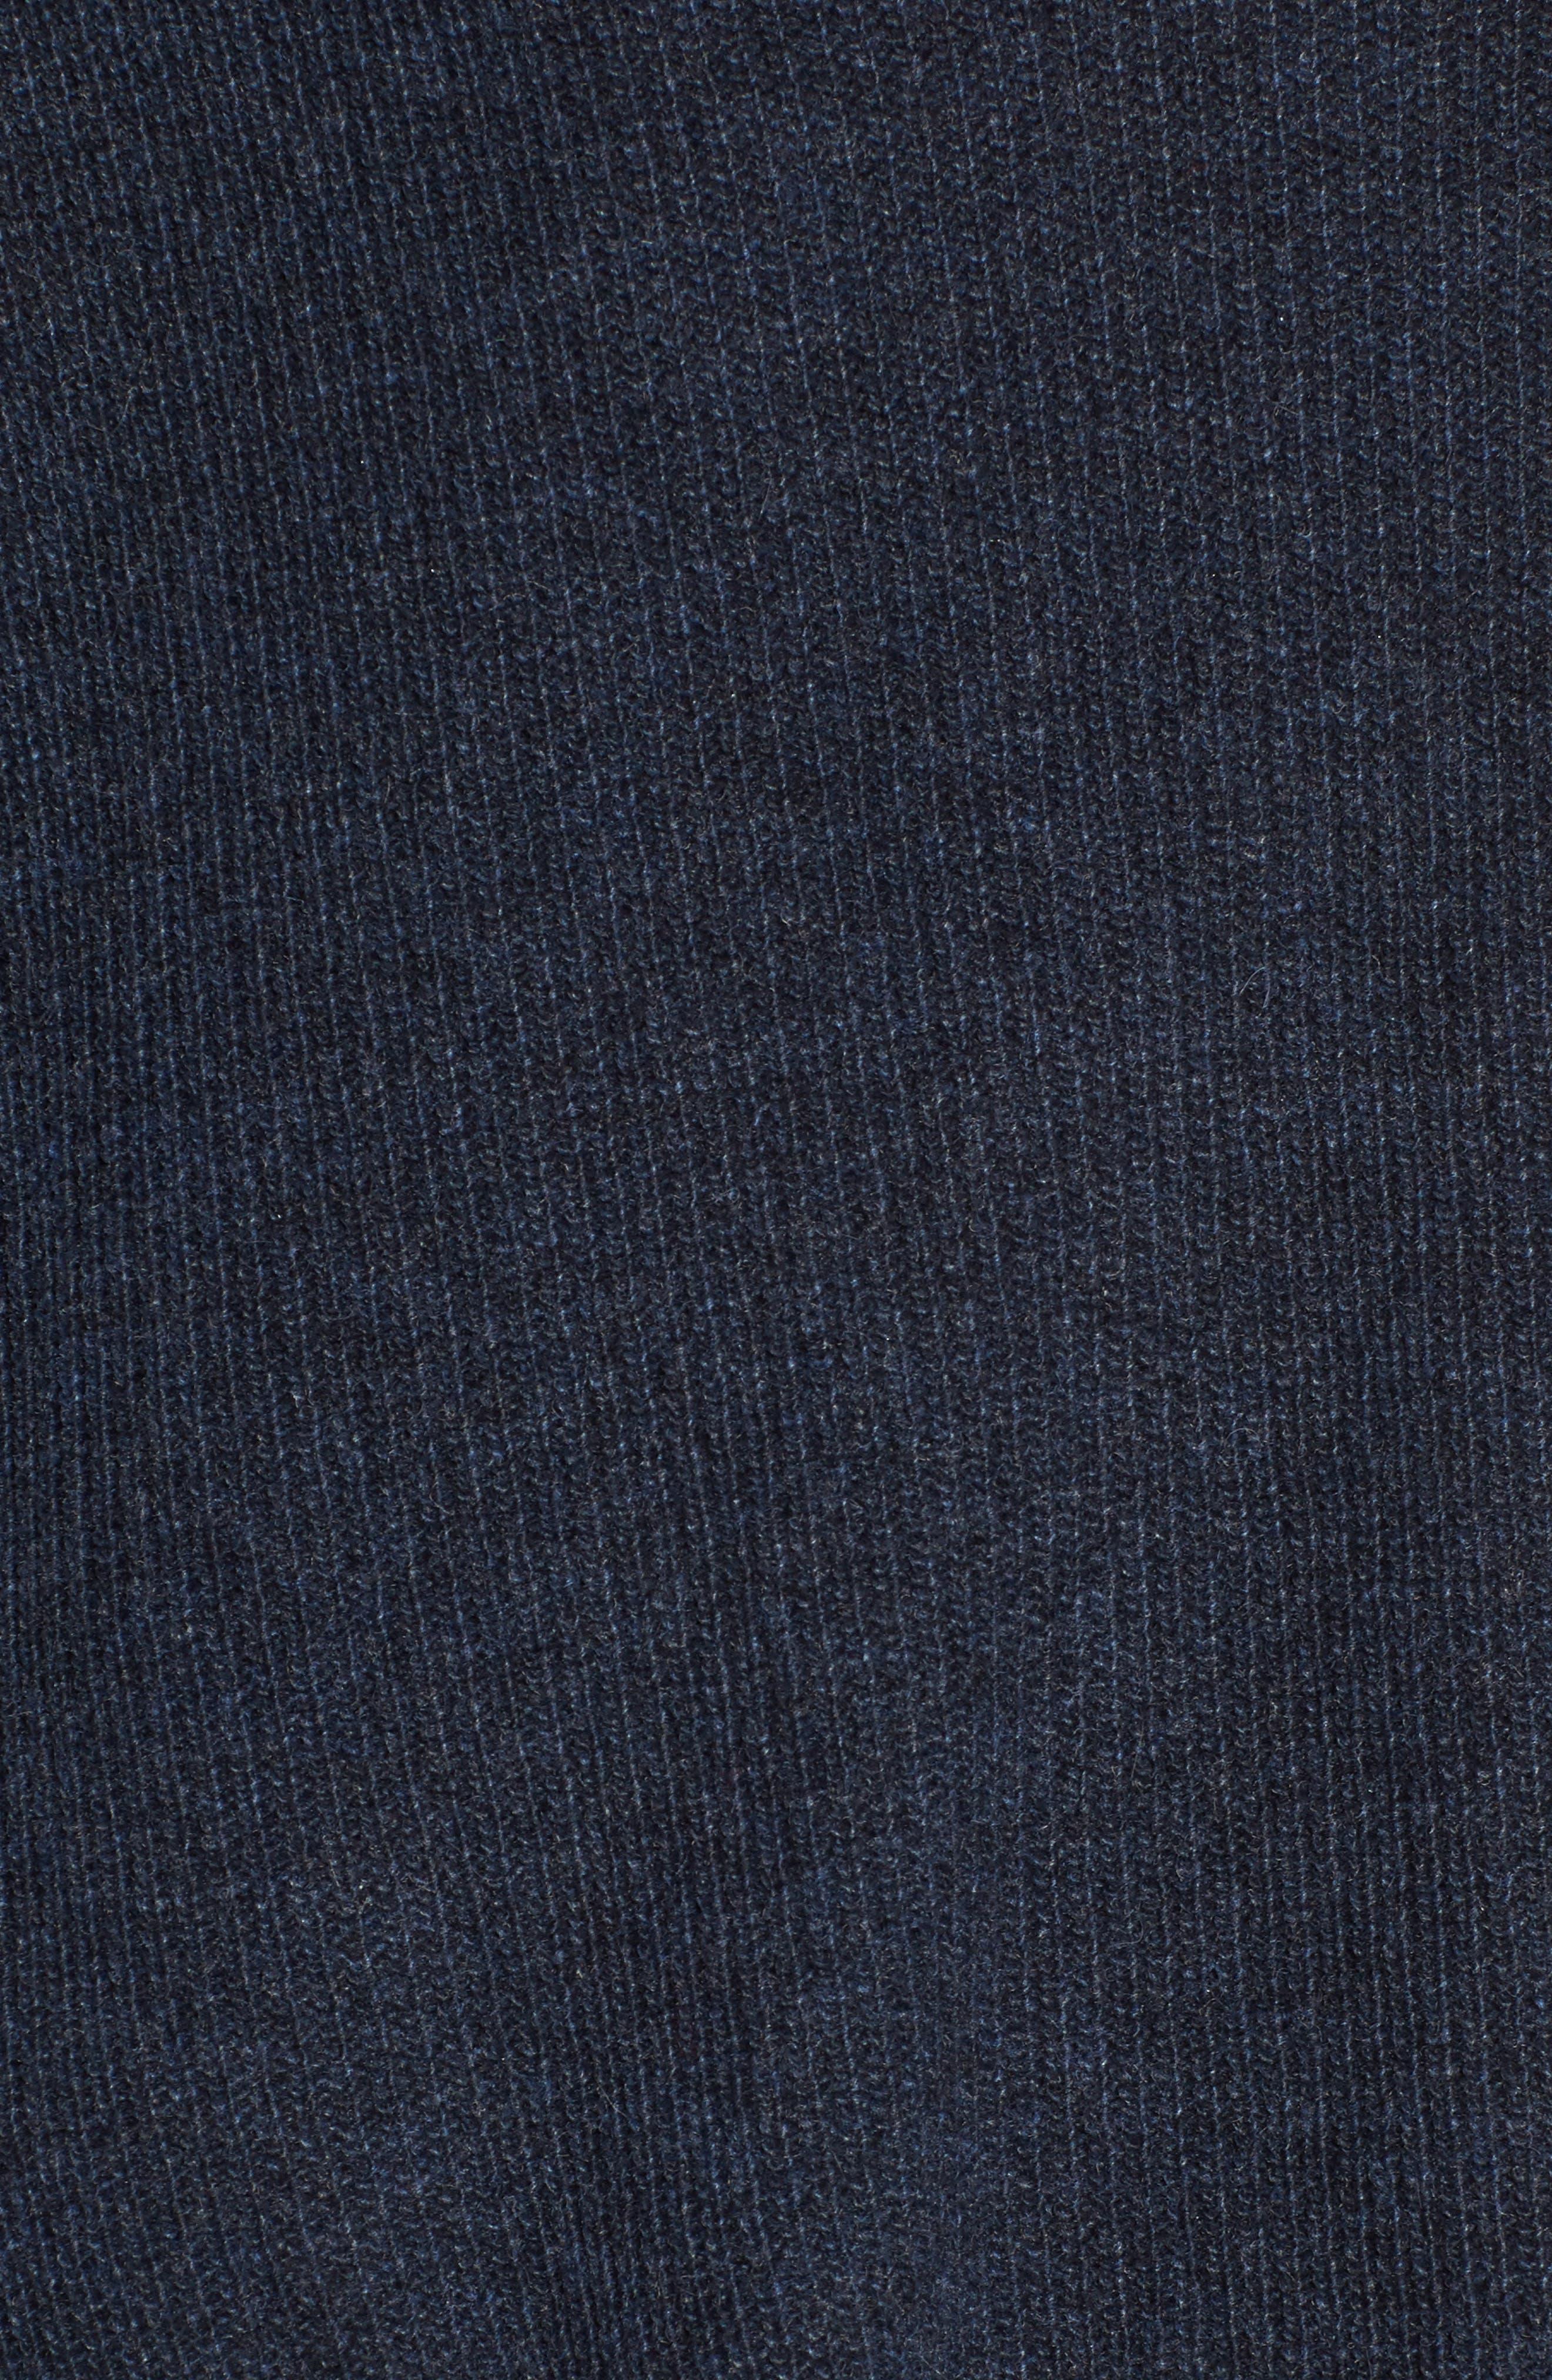 Warmlight V-Neck Sweater,                             Alternate thumbnail 5, color,                             400